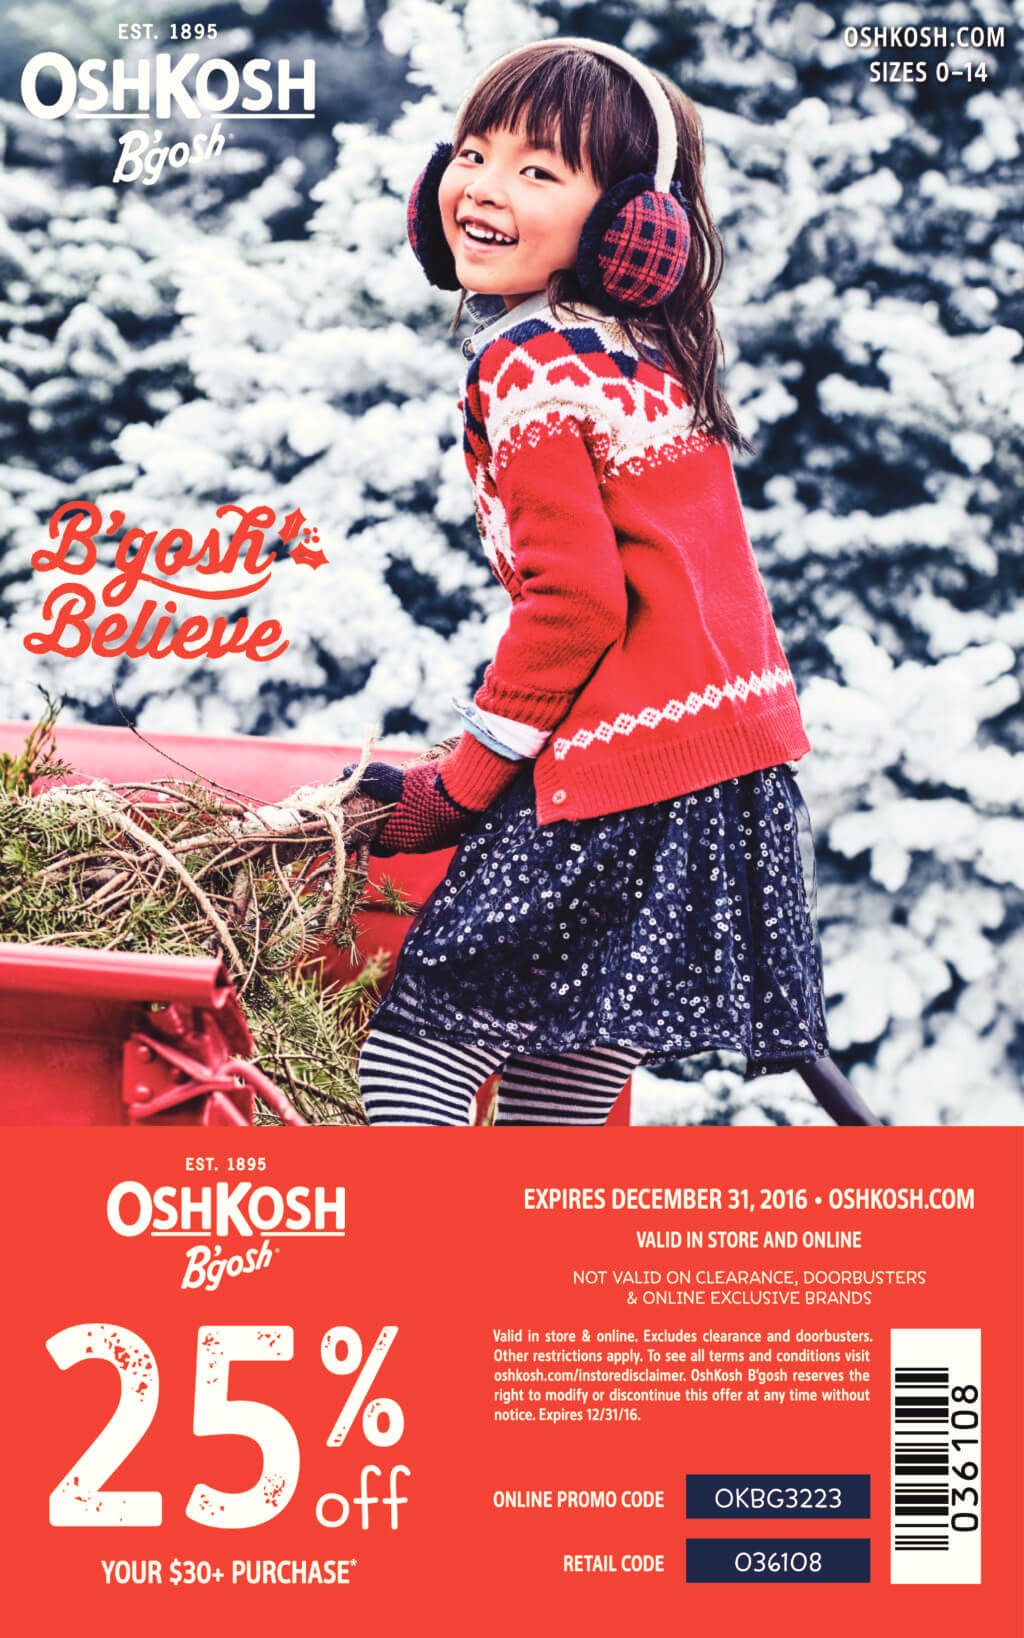 Get ready for the holidays w @OshKoshBgosh! Come grab a coupon code! #BgoshBelieve #ad